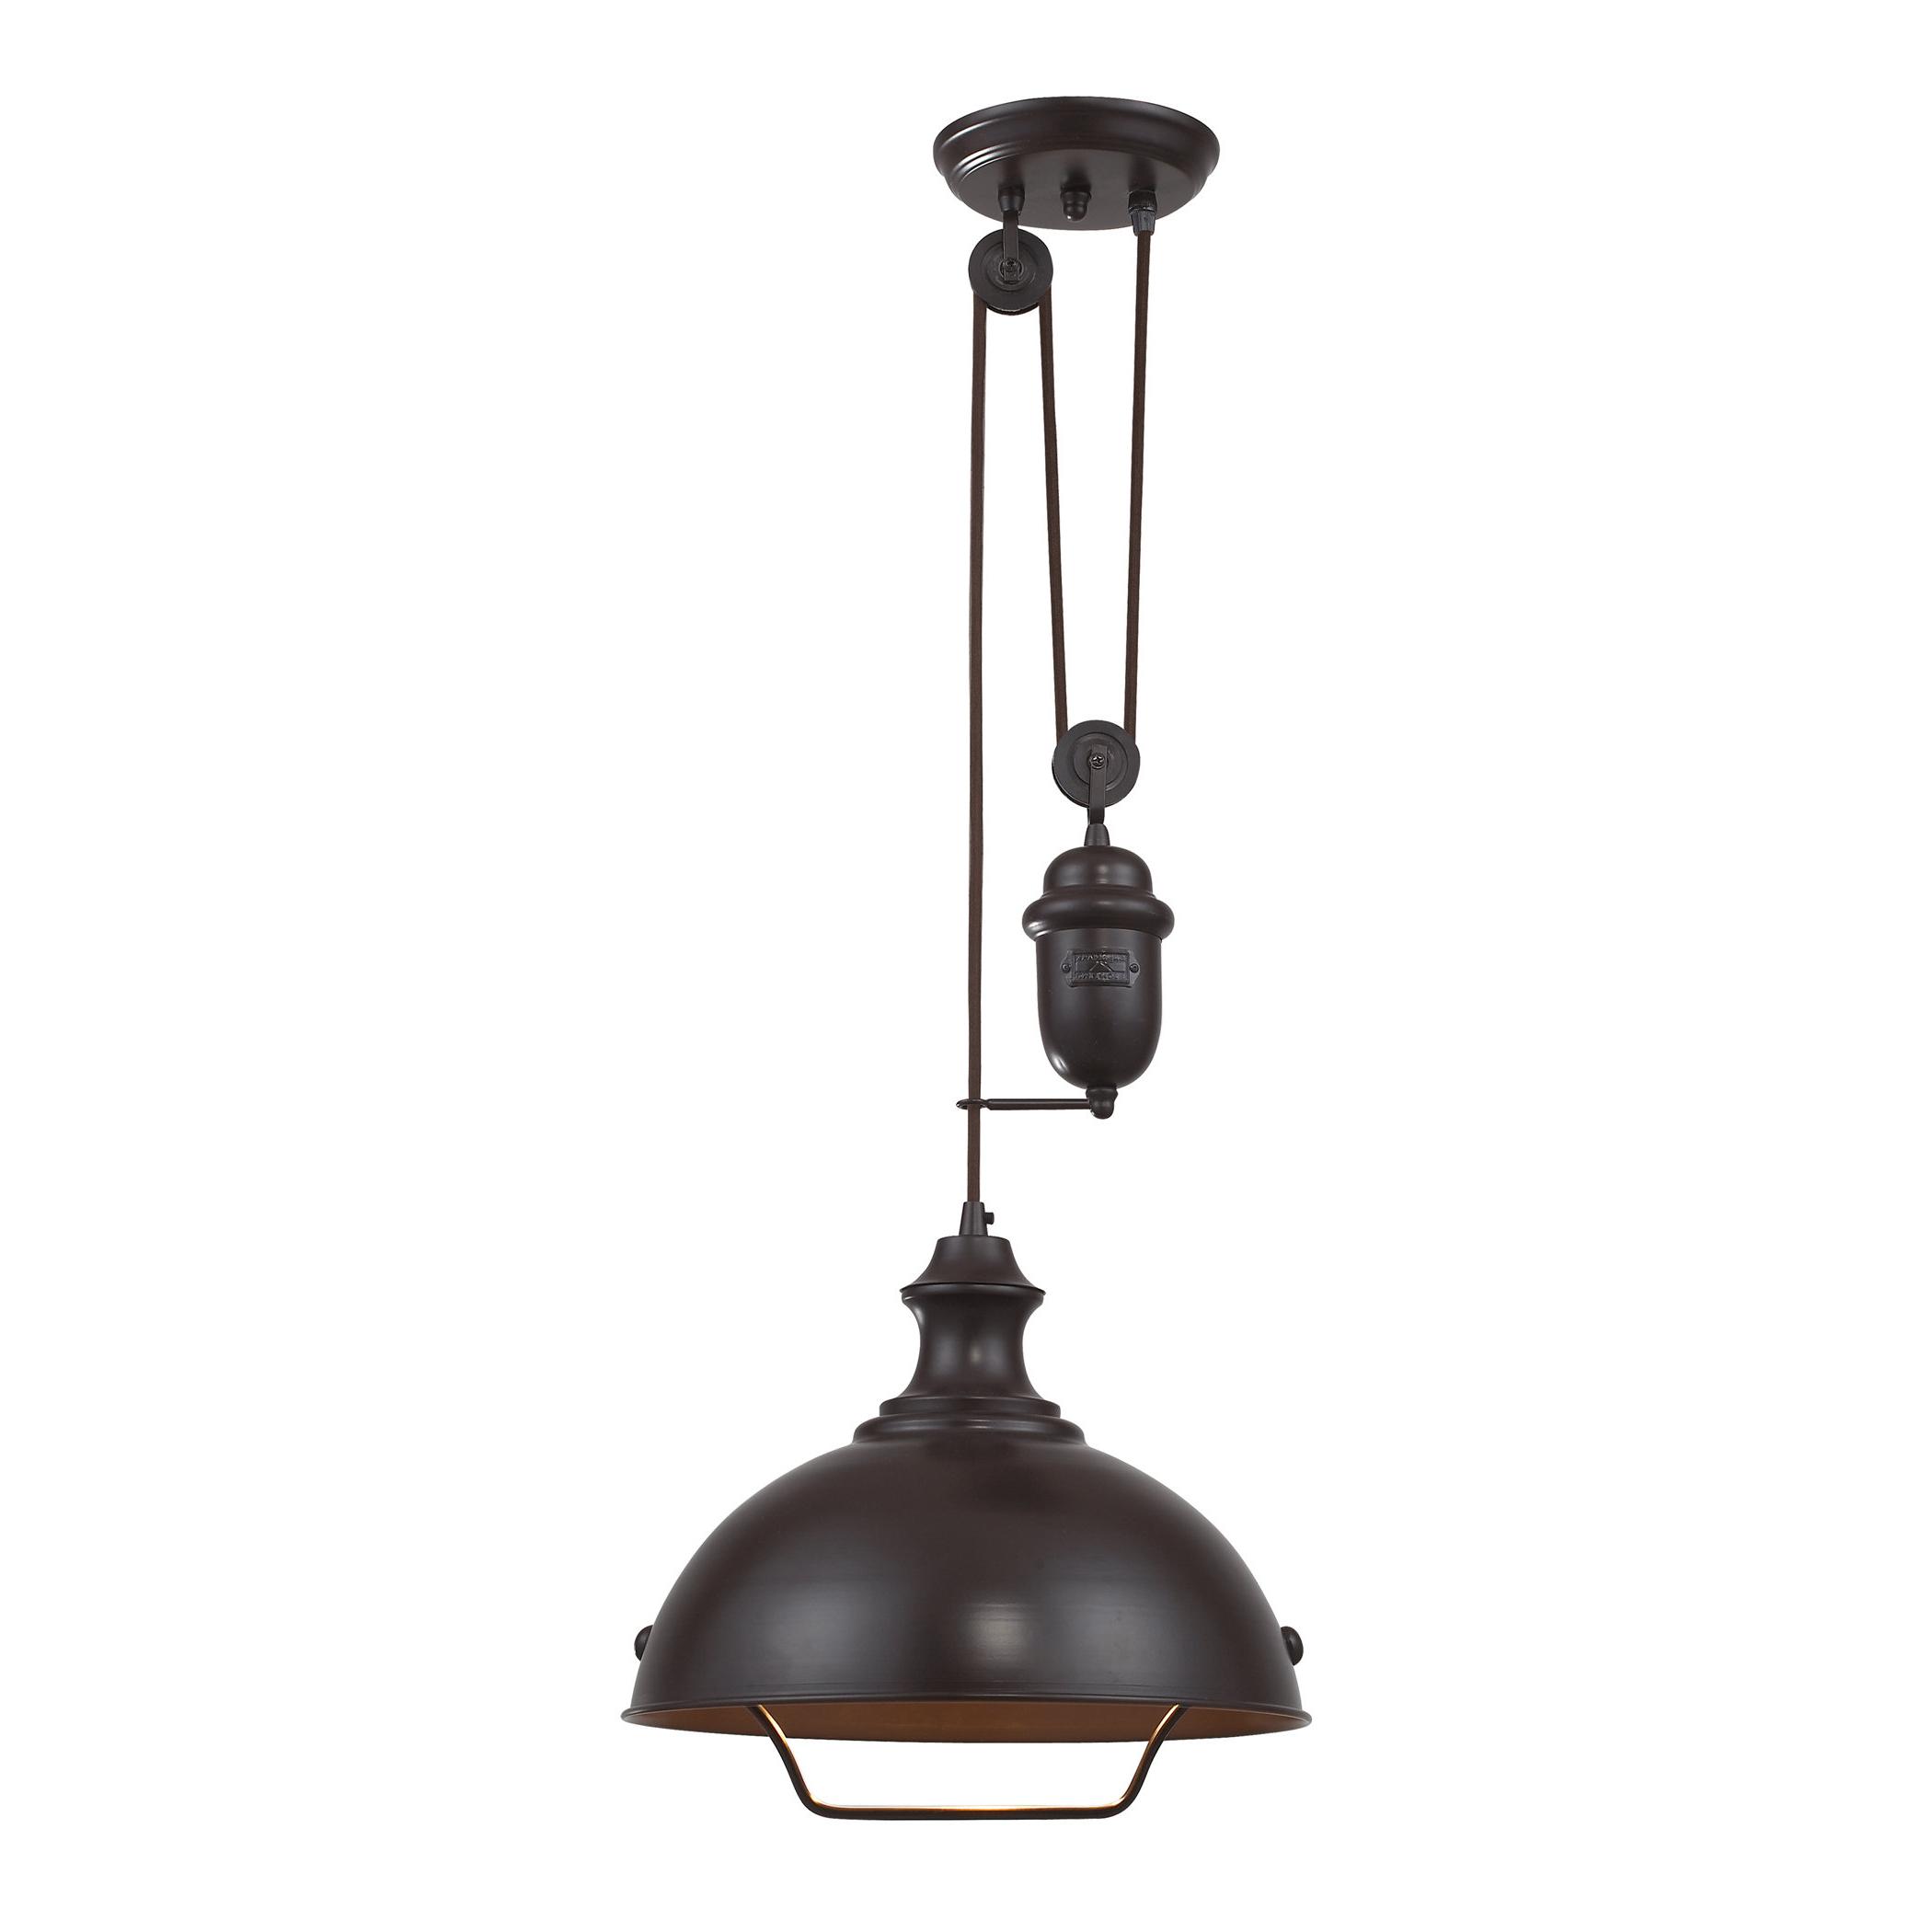 Trendy Stetson 1 Light Bowl Pendants Regarding Legrand 1 Light Single Dome Pendant (View 16 of 20)